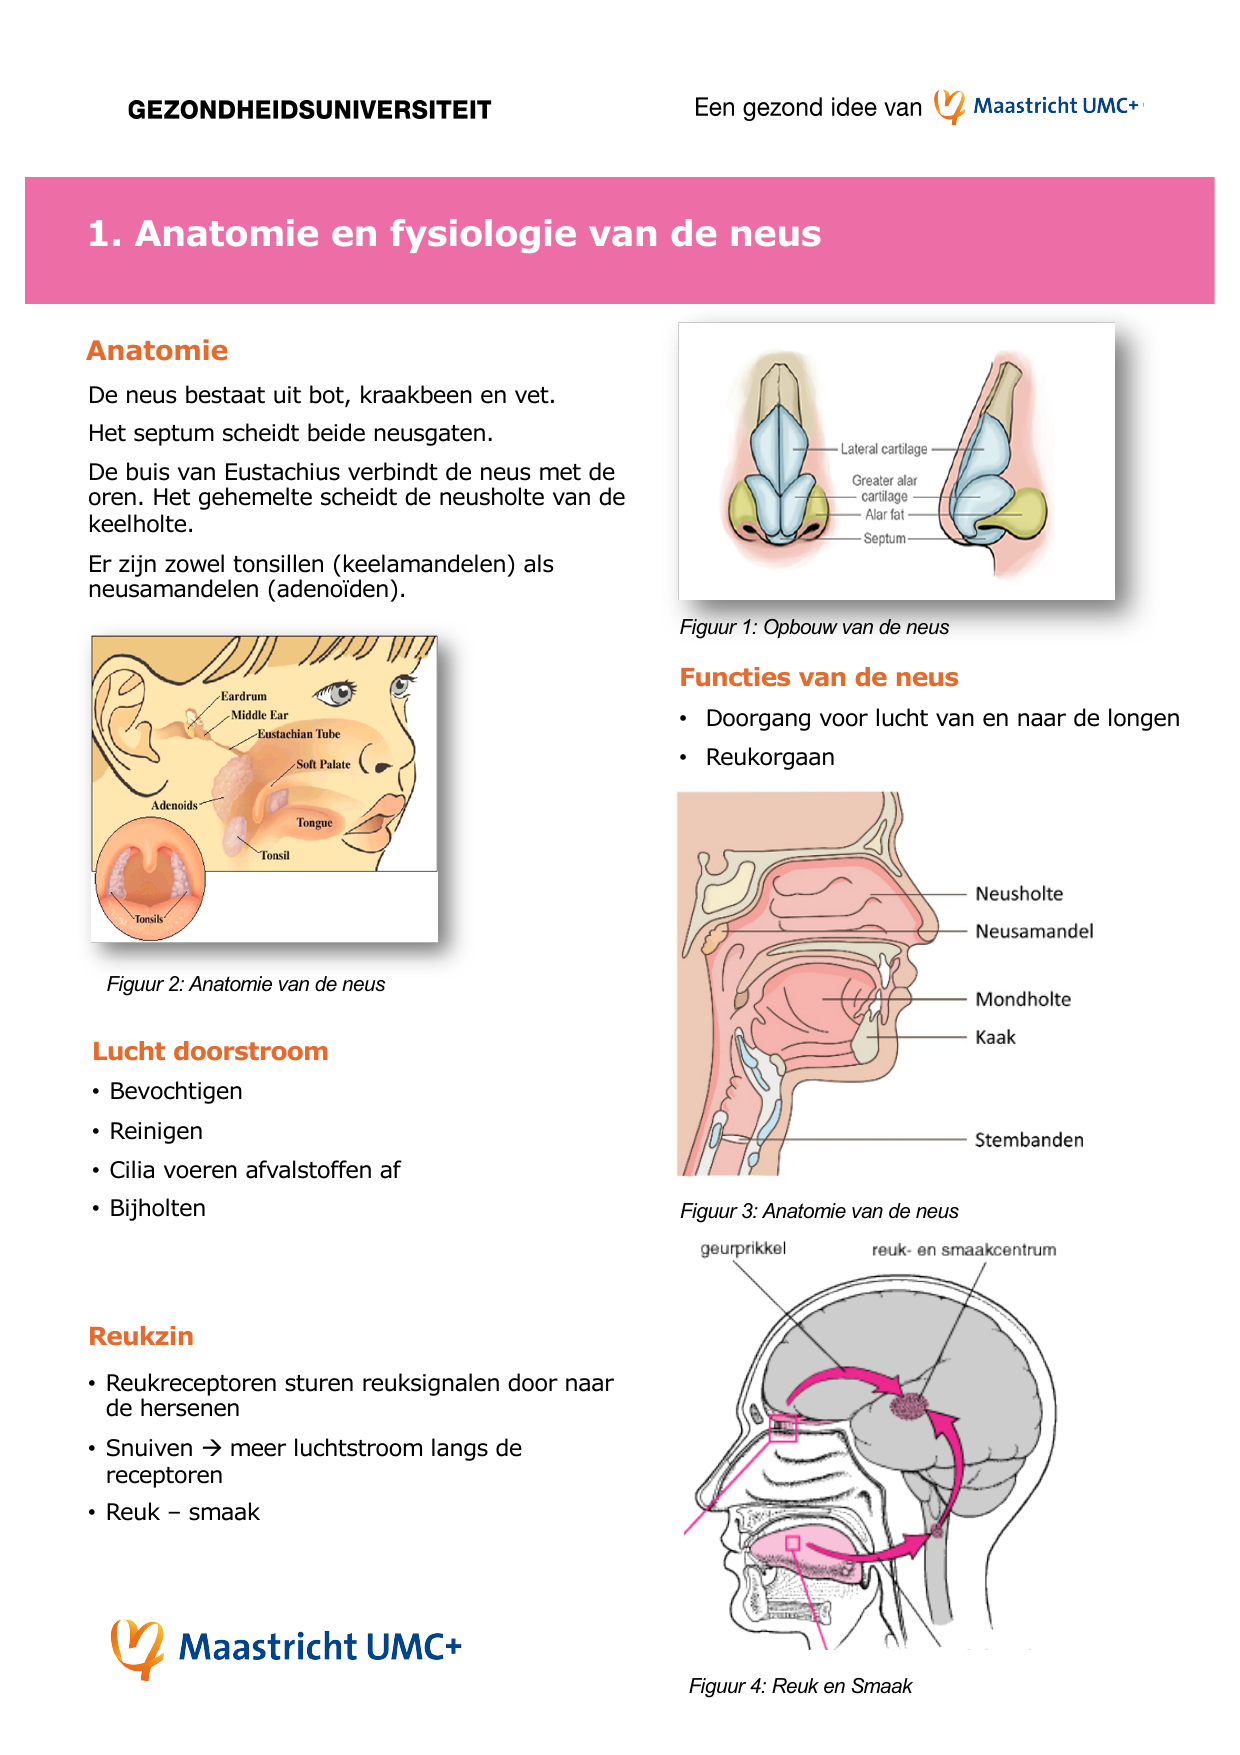 anatomie neus uitwendig